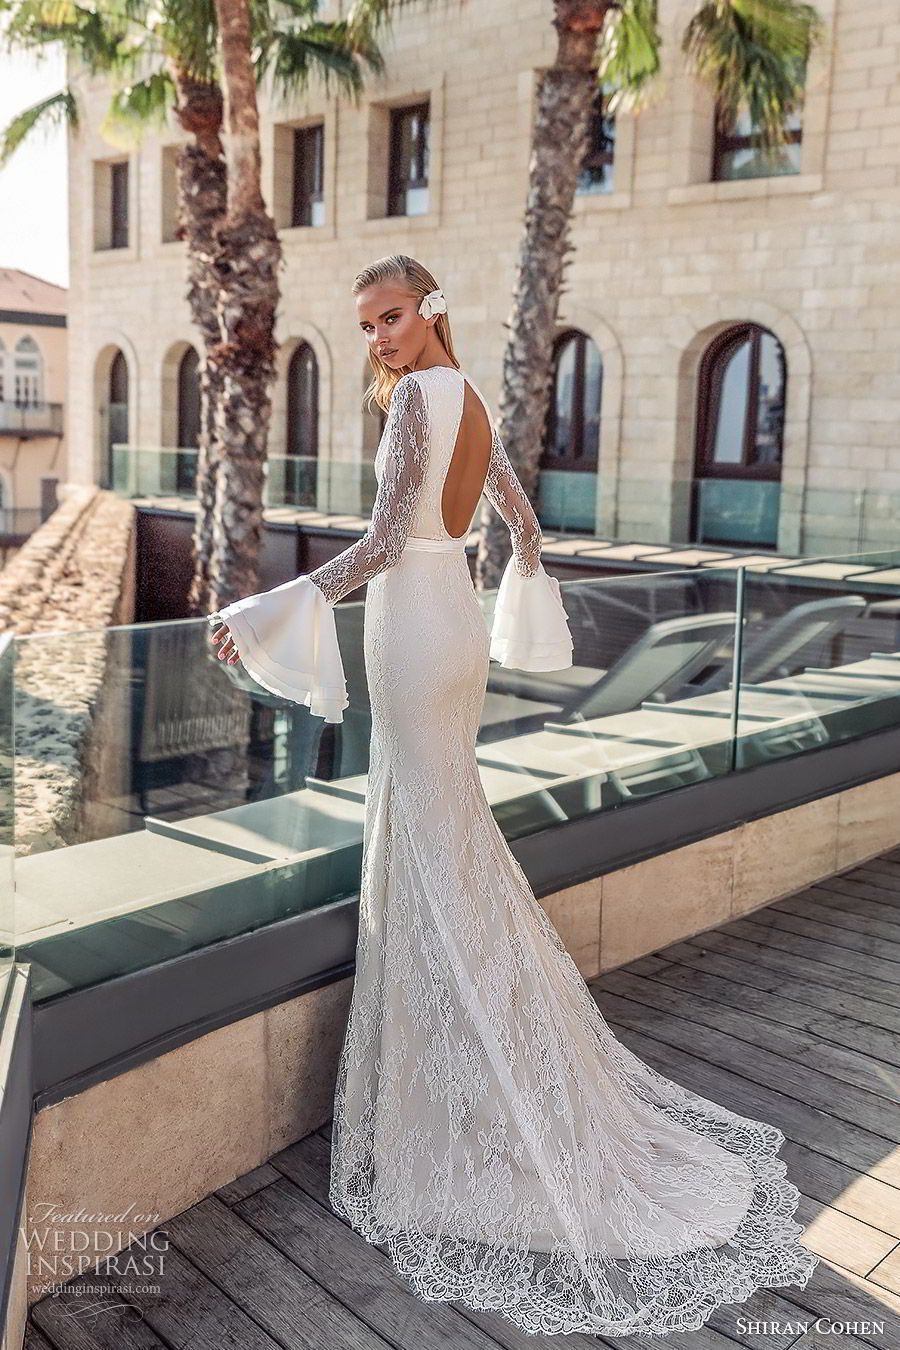 3bb5e6a46003 shiran cohen 2019 bridal long bell sleeves high neckline cutout bodice lace  sheath trumpet wedding dress chapel train open back slit skirt sexy modern  (3) ...